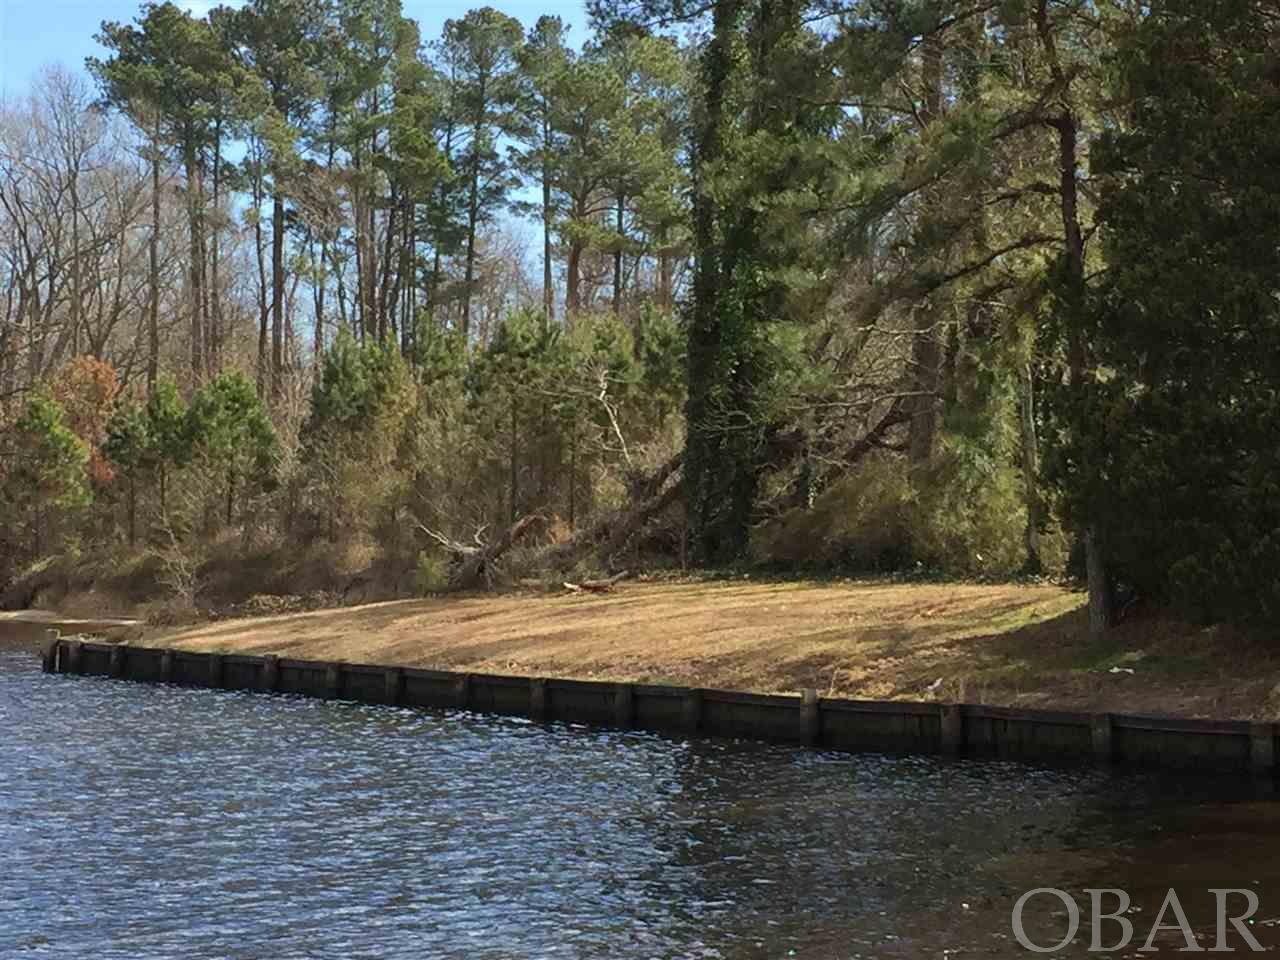 1793 Tulls Creek Road,Moyock,NC 27958,Lots/land,Tulls Creek Road,95335